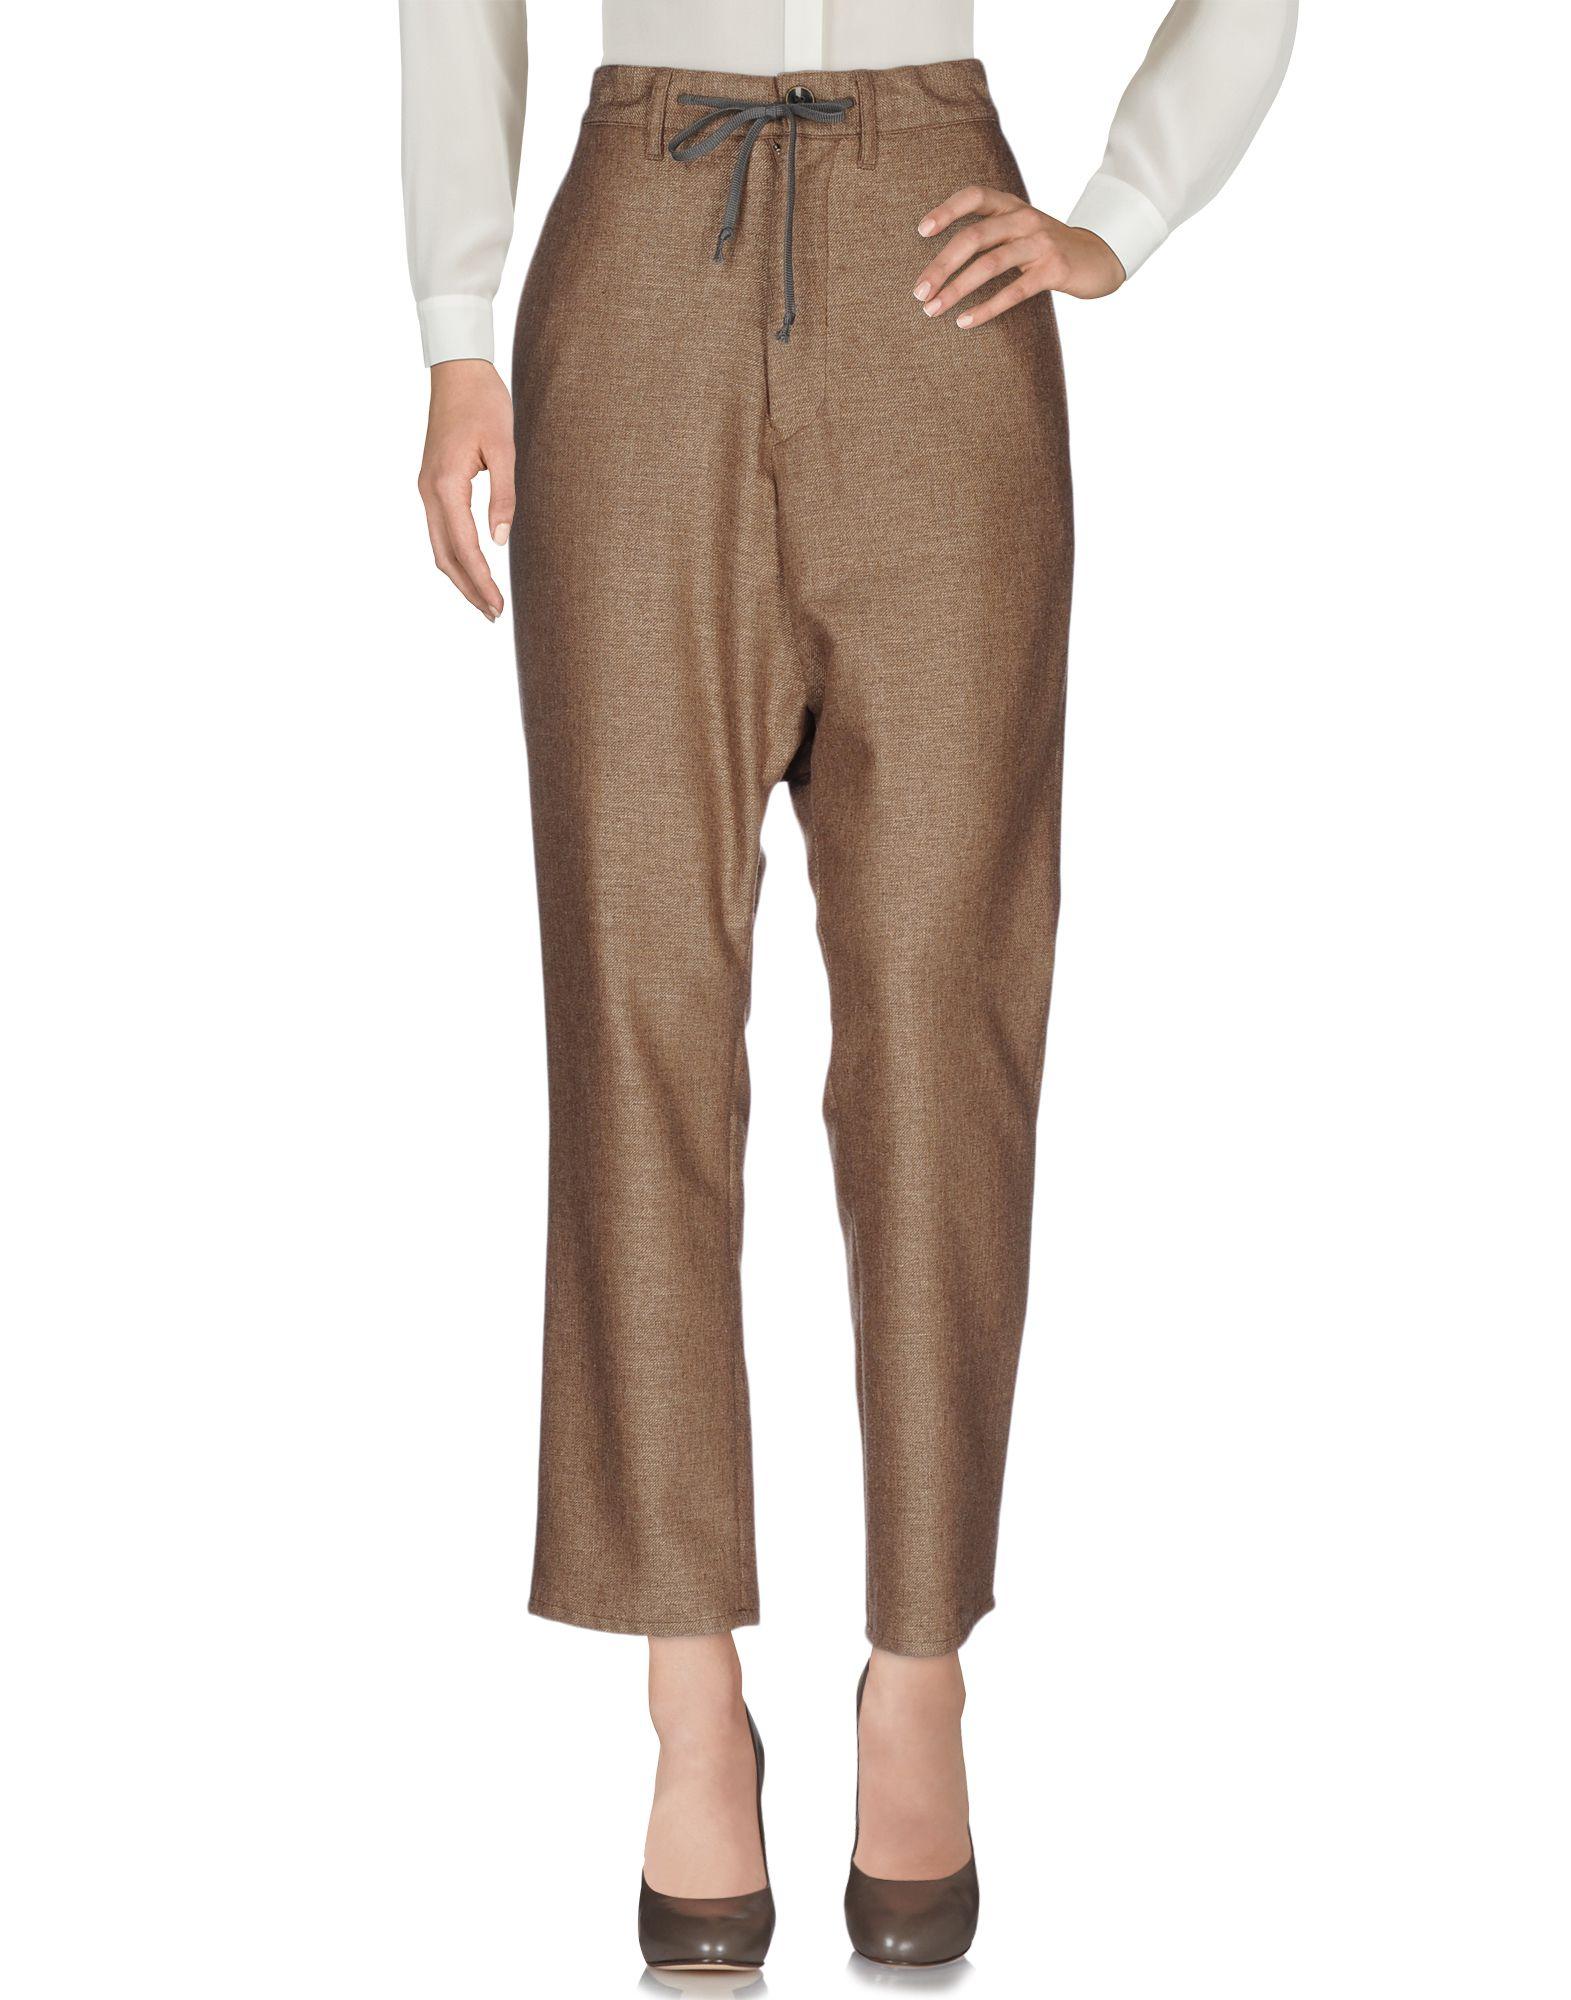 L.G.B. Casual Pants in Khaki